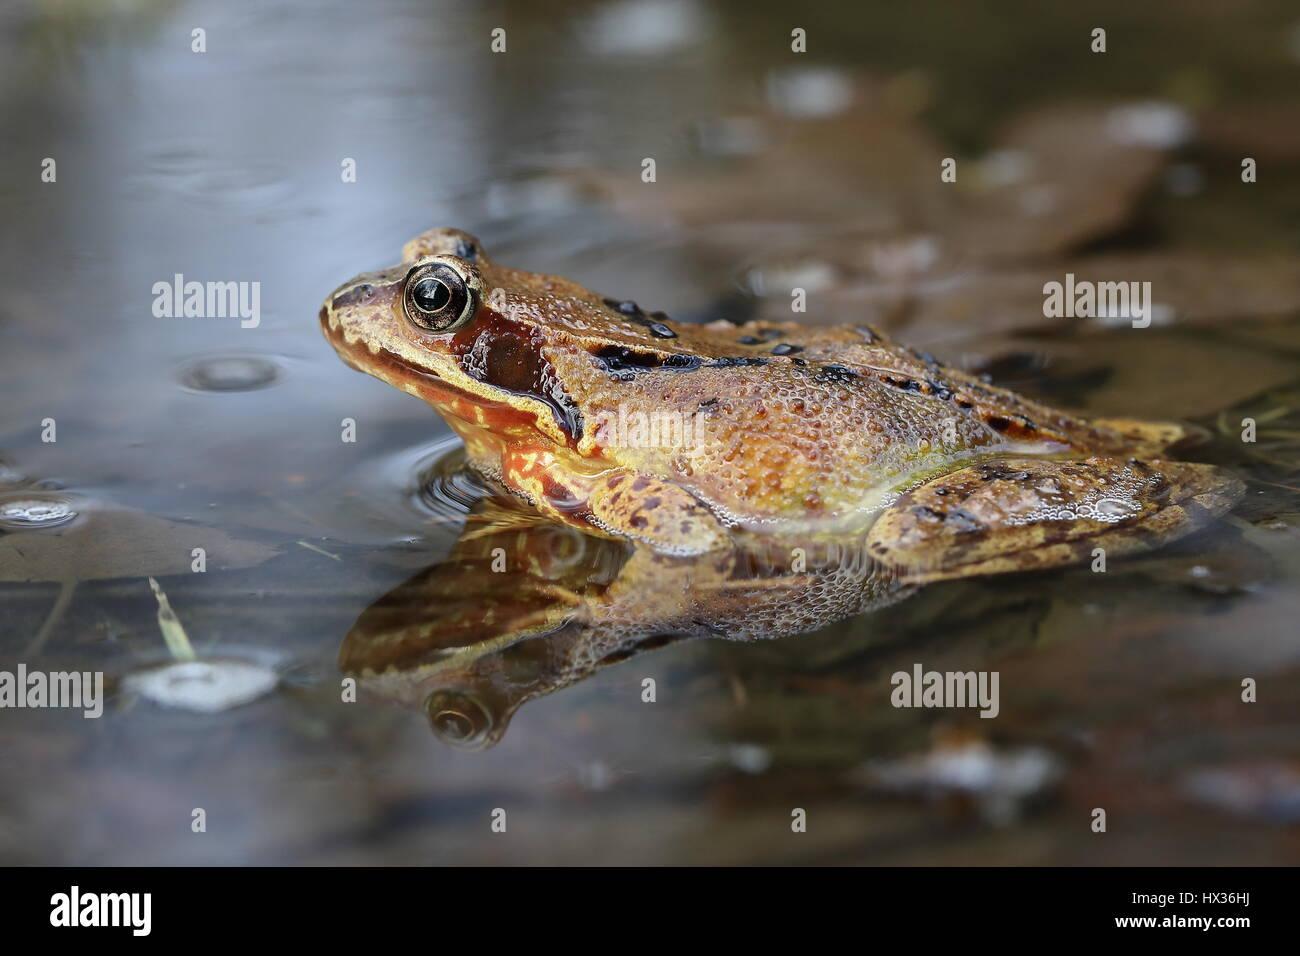 European common frog (Rana temporaria) sitting in shallow water, Malscheid Nature Reserve, Siegerland, North Rhine - Stock Image